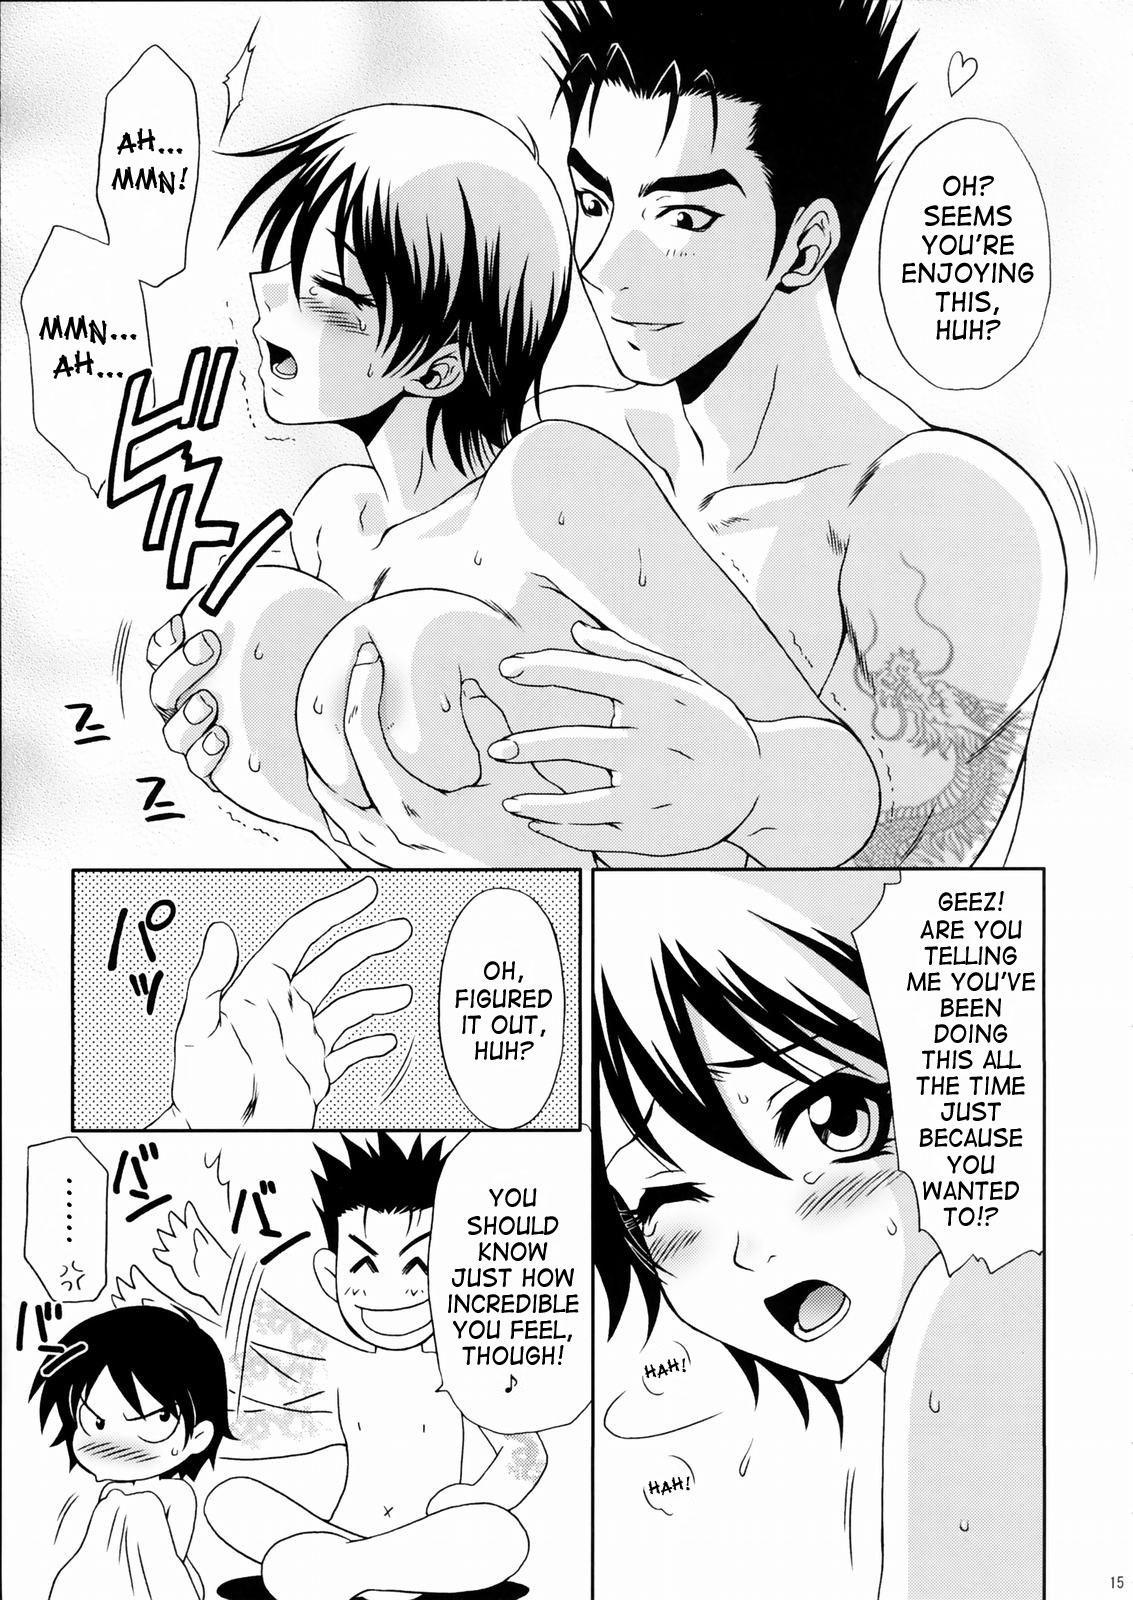 (C66) [U.R.C (Momoya Show-Neko)] Rikuson-chan ~Lovely Gunshi no Himitsu~ | Rikuson-chan Secret of The Lovely Strategist (Dynasty Warriors) [English] [SaHa] 13